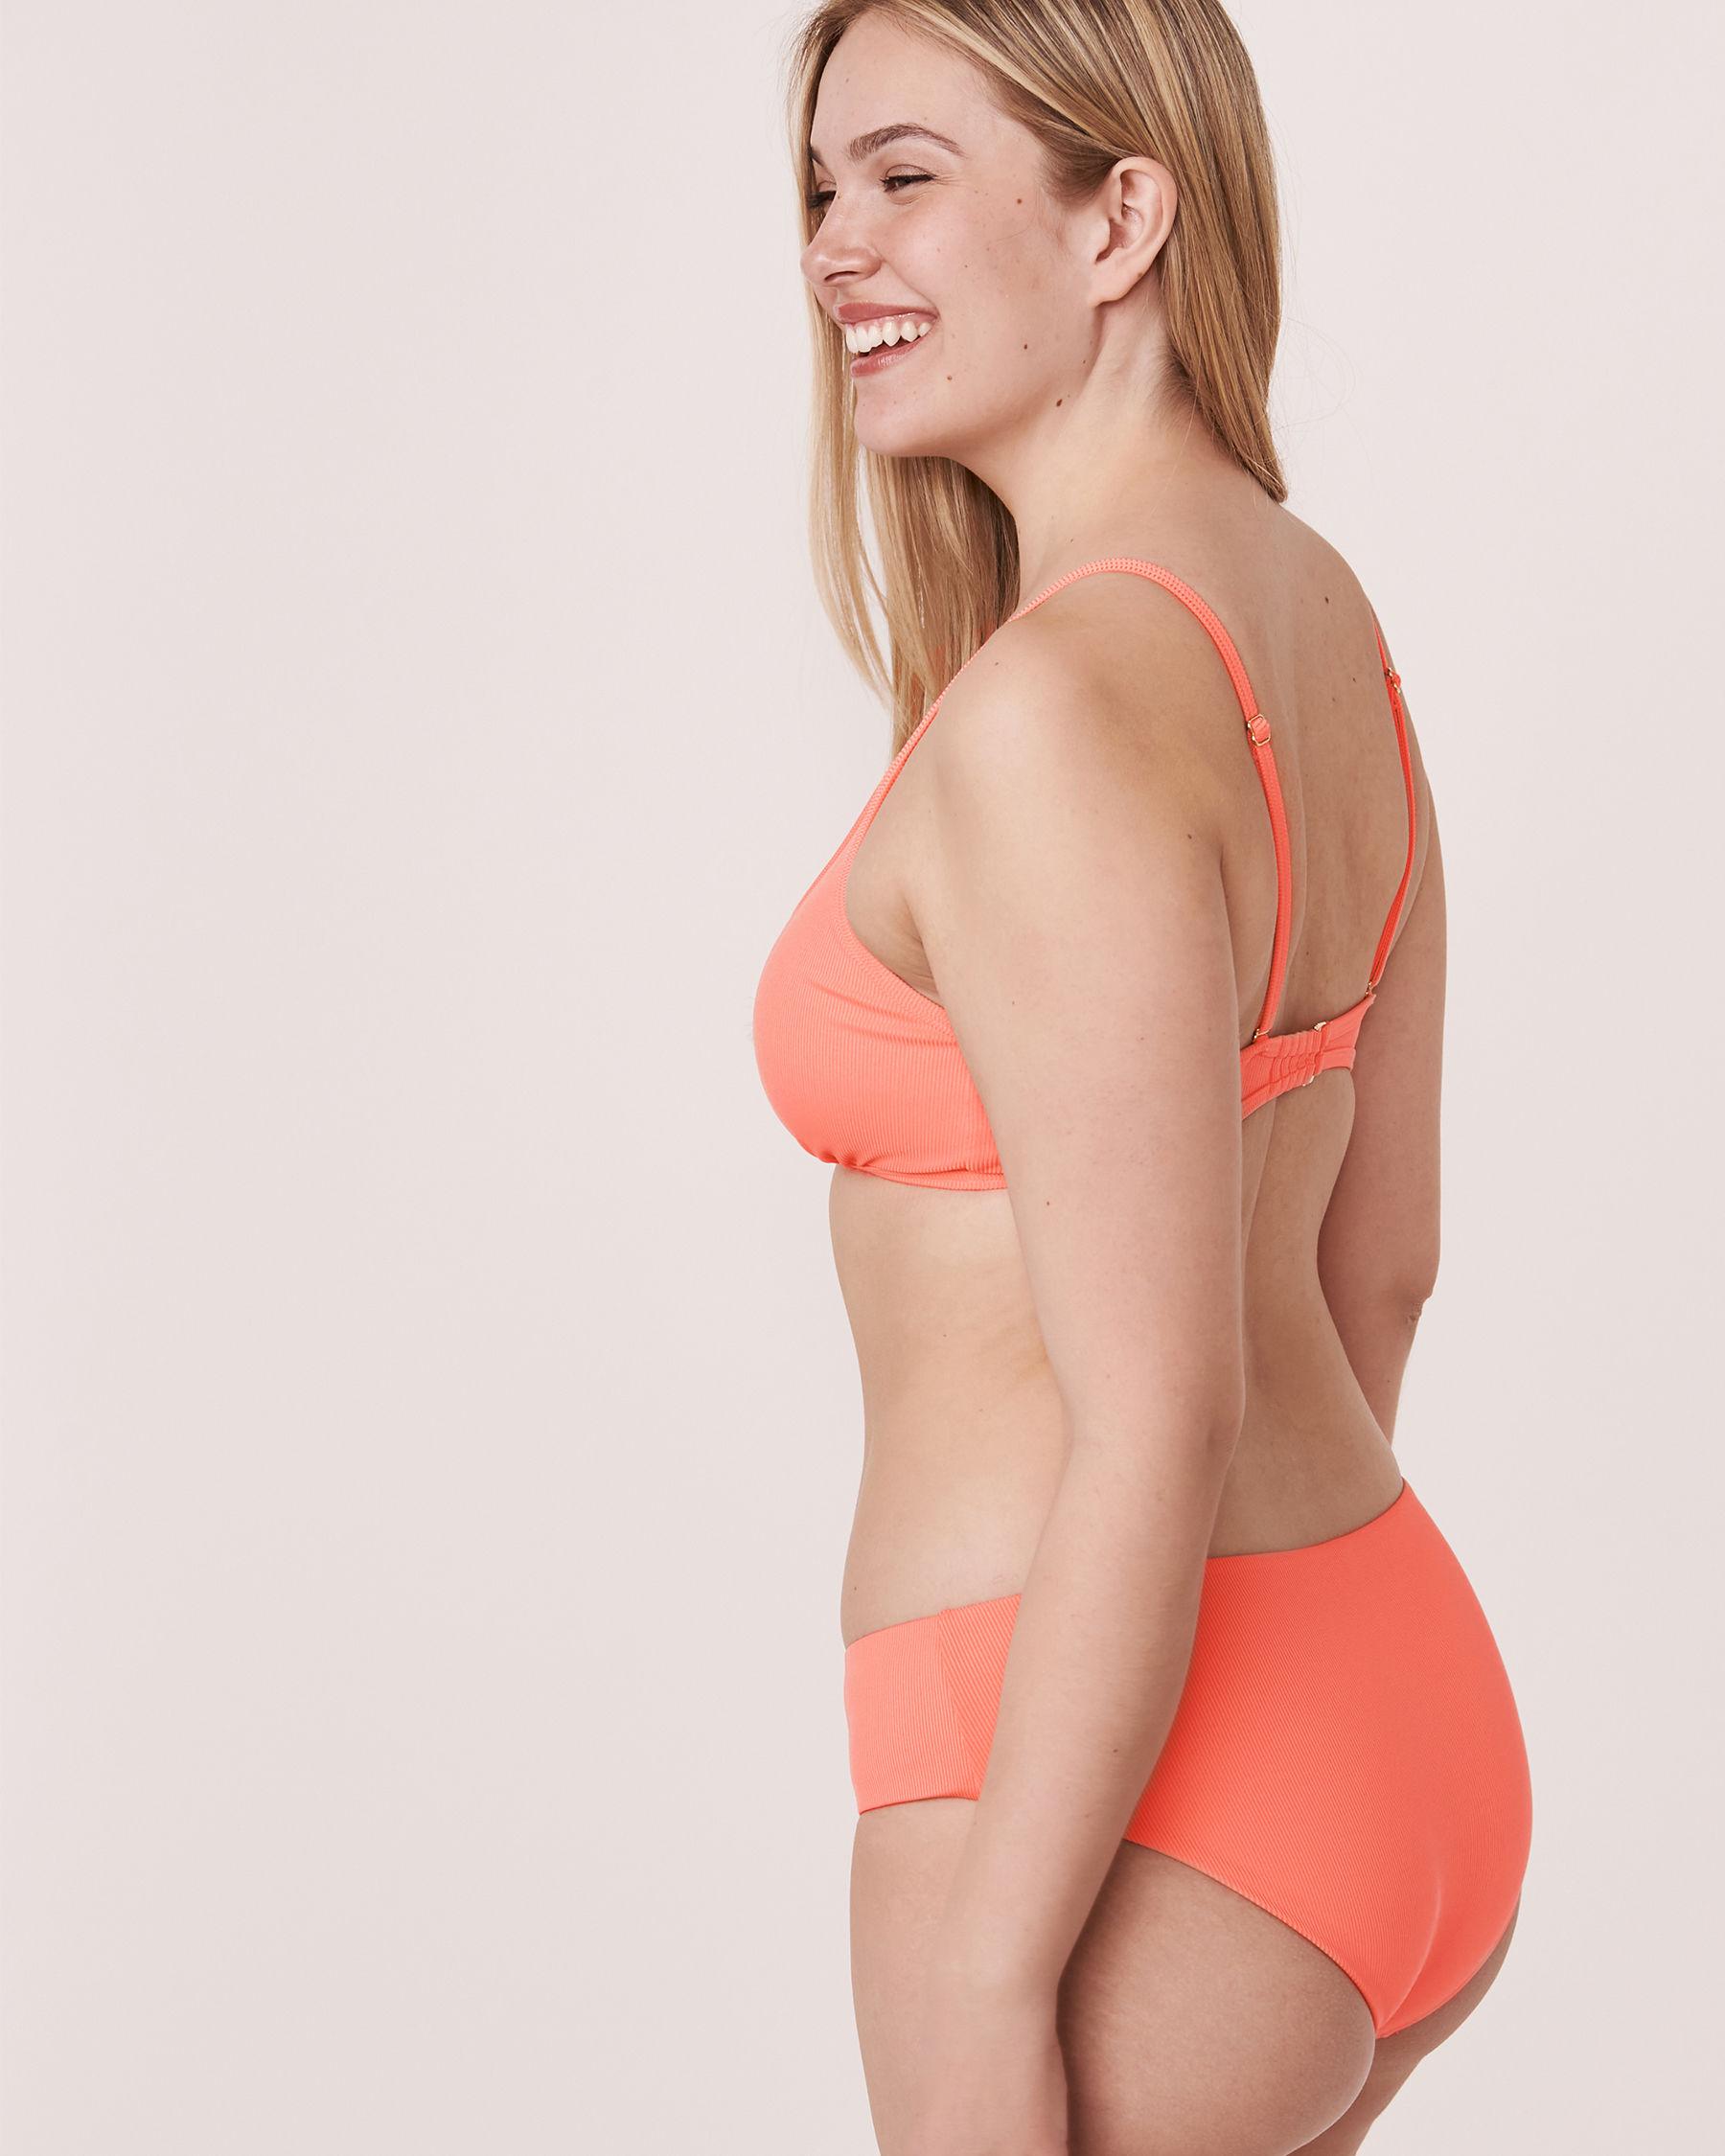 AQUAROSE SOLID RIB Recycled Fibers Bralette Bikini Top Coral 70100059 - View2